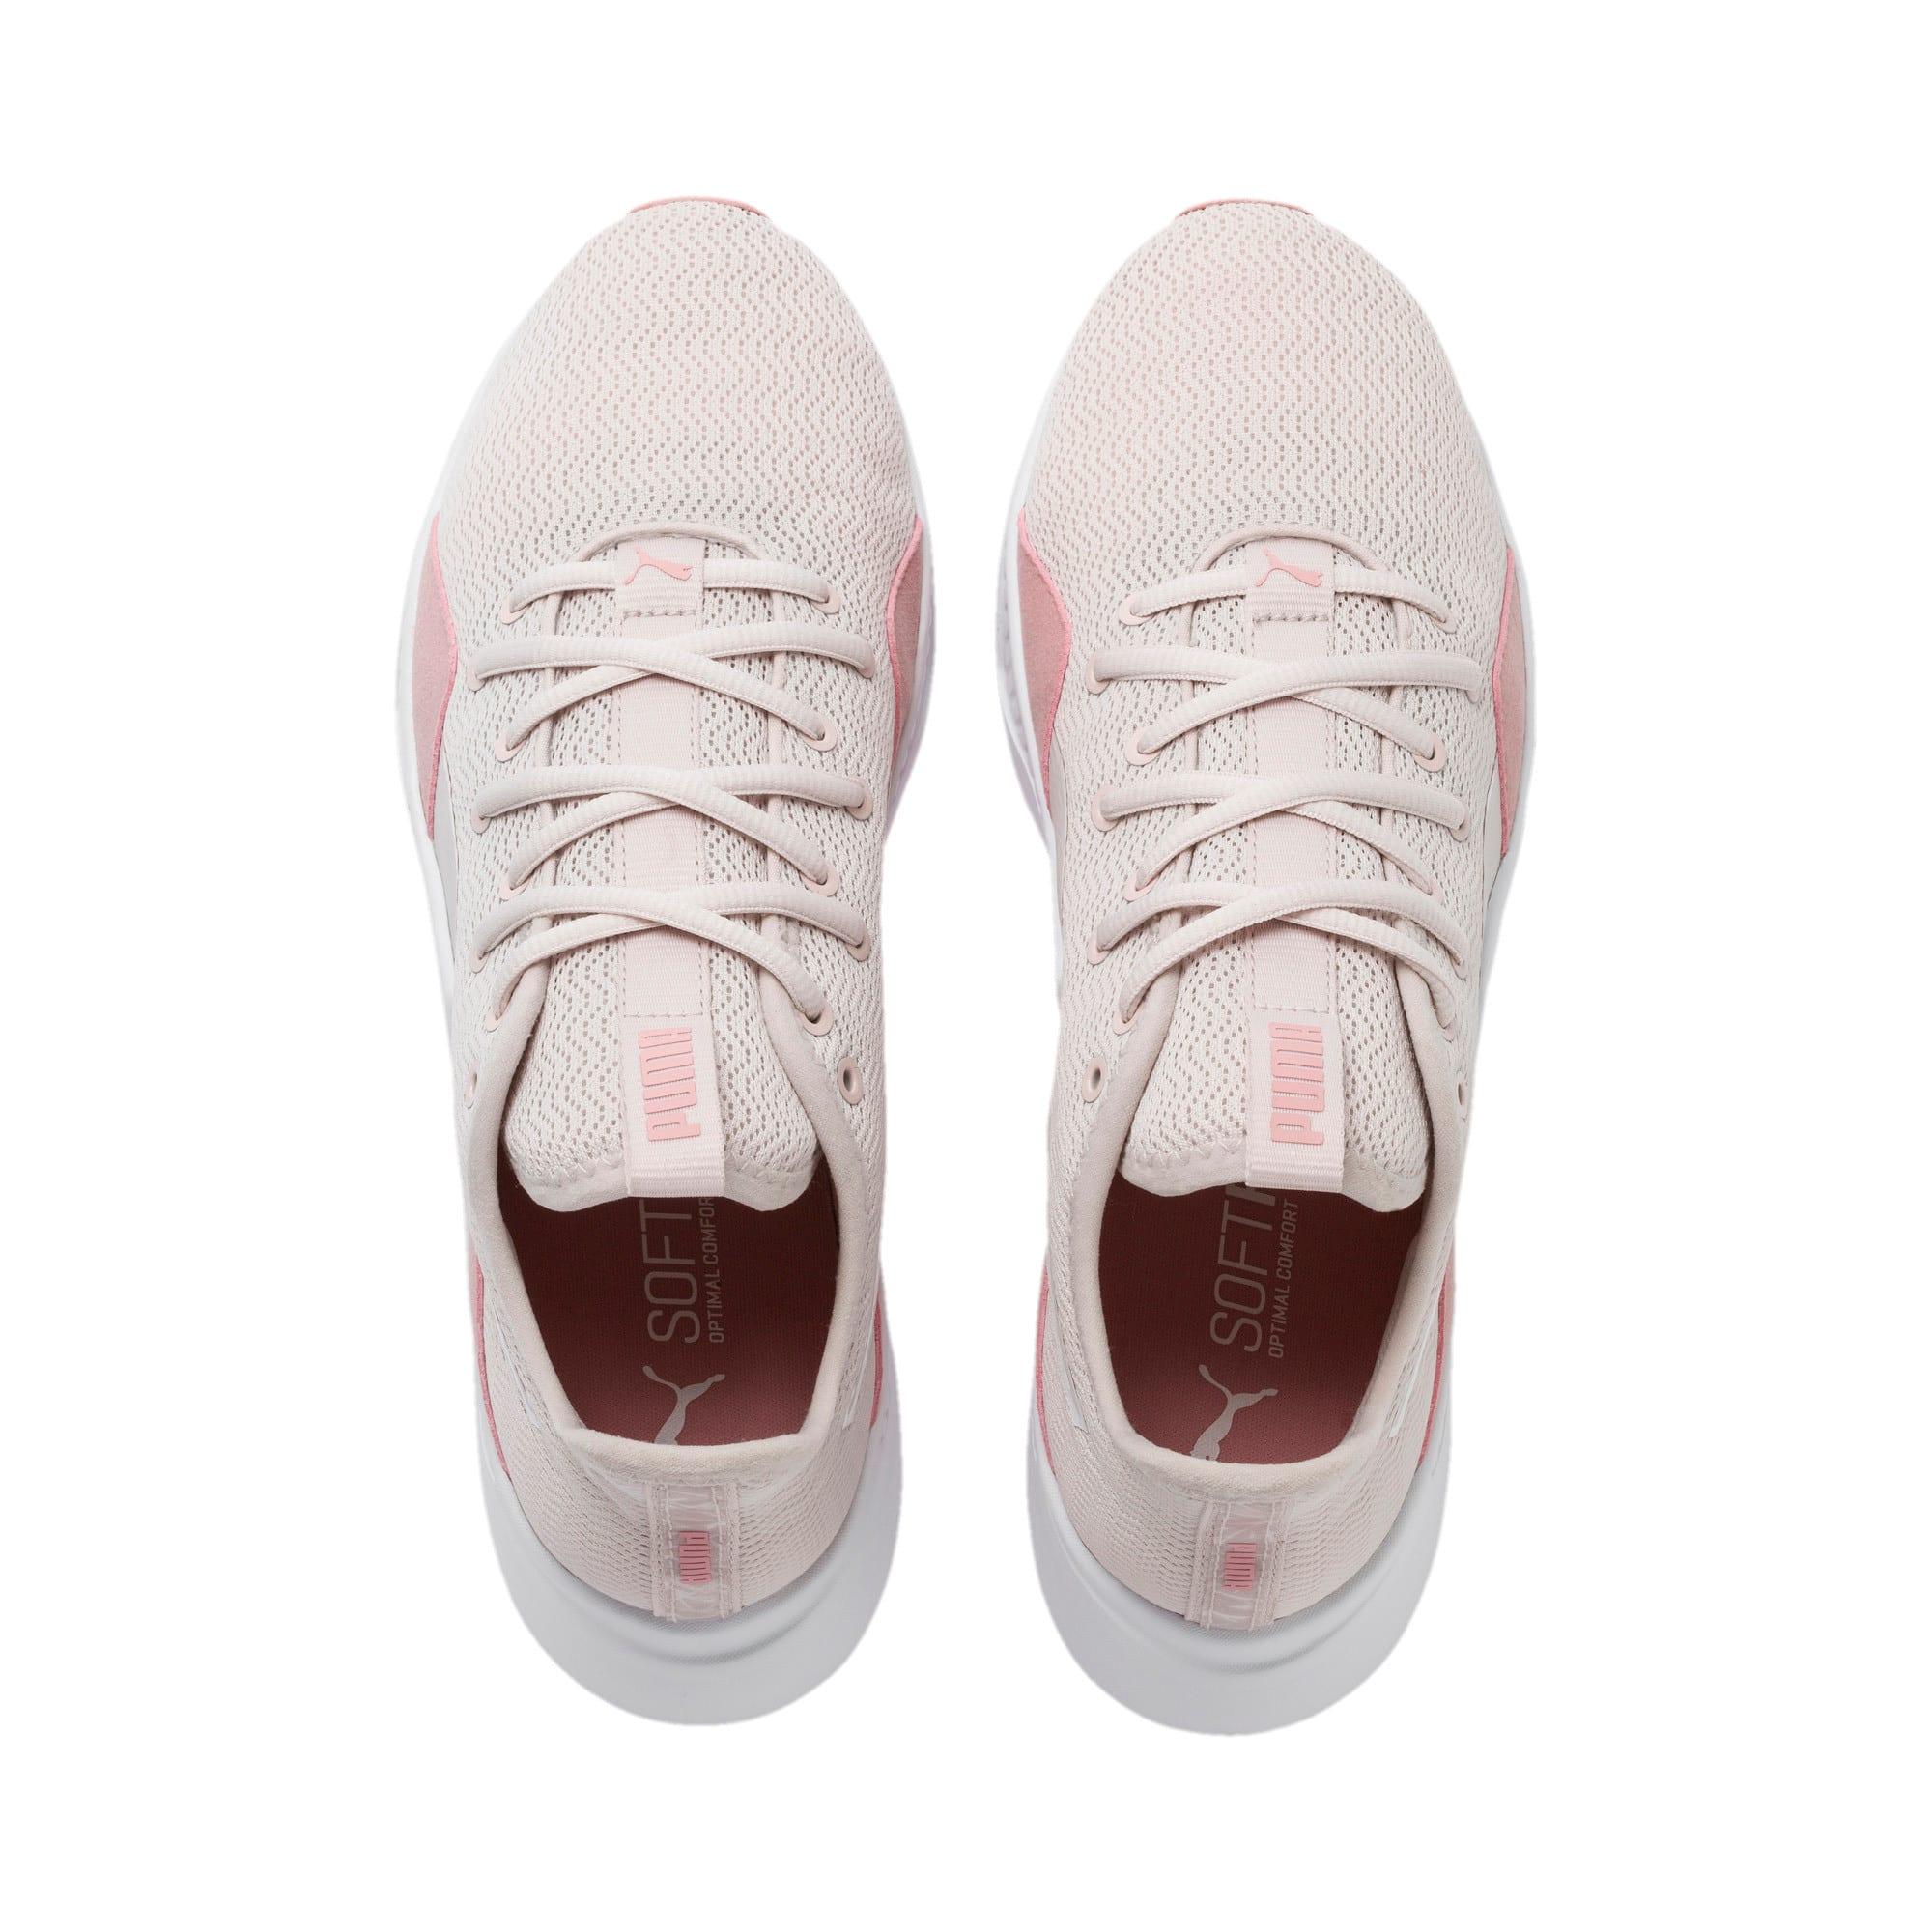 Thumbnail 7 of Incite FS Shift Women's Training Shoes, Pastel Parchment-Rose-White, medium